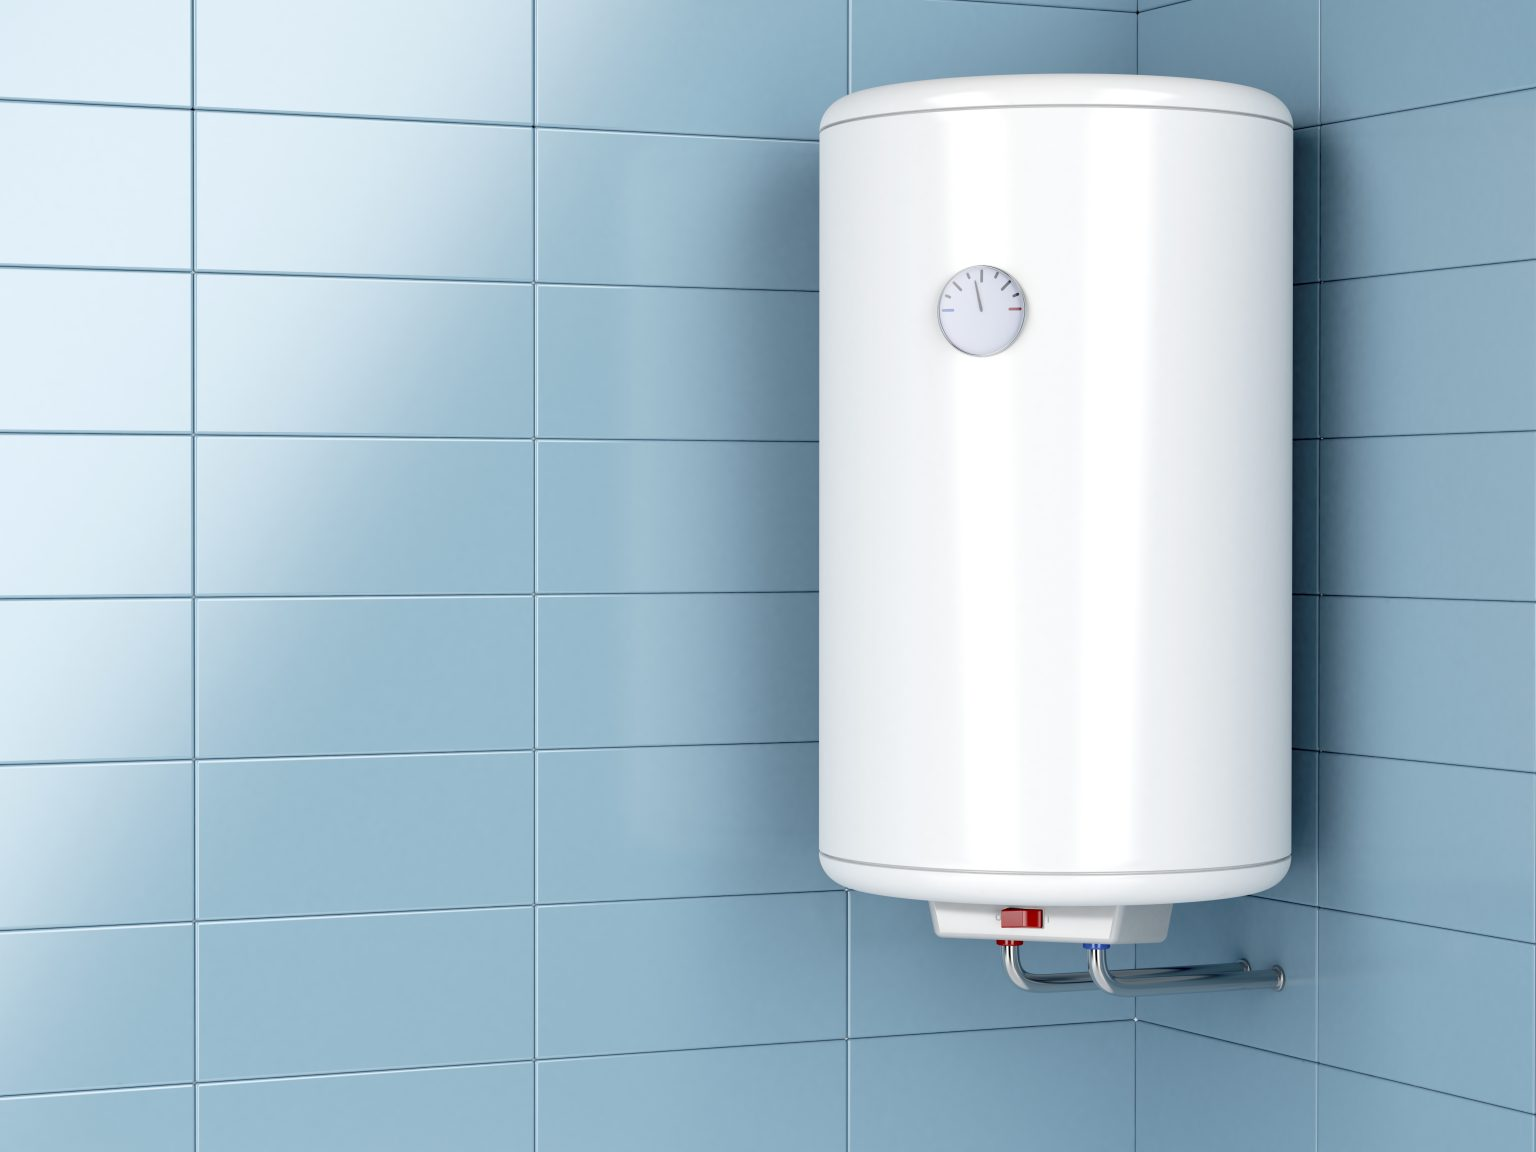 Water-Heater-Maintenance-Tips-1536x1152